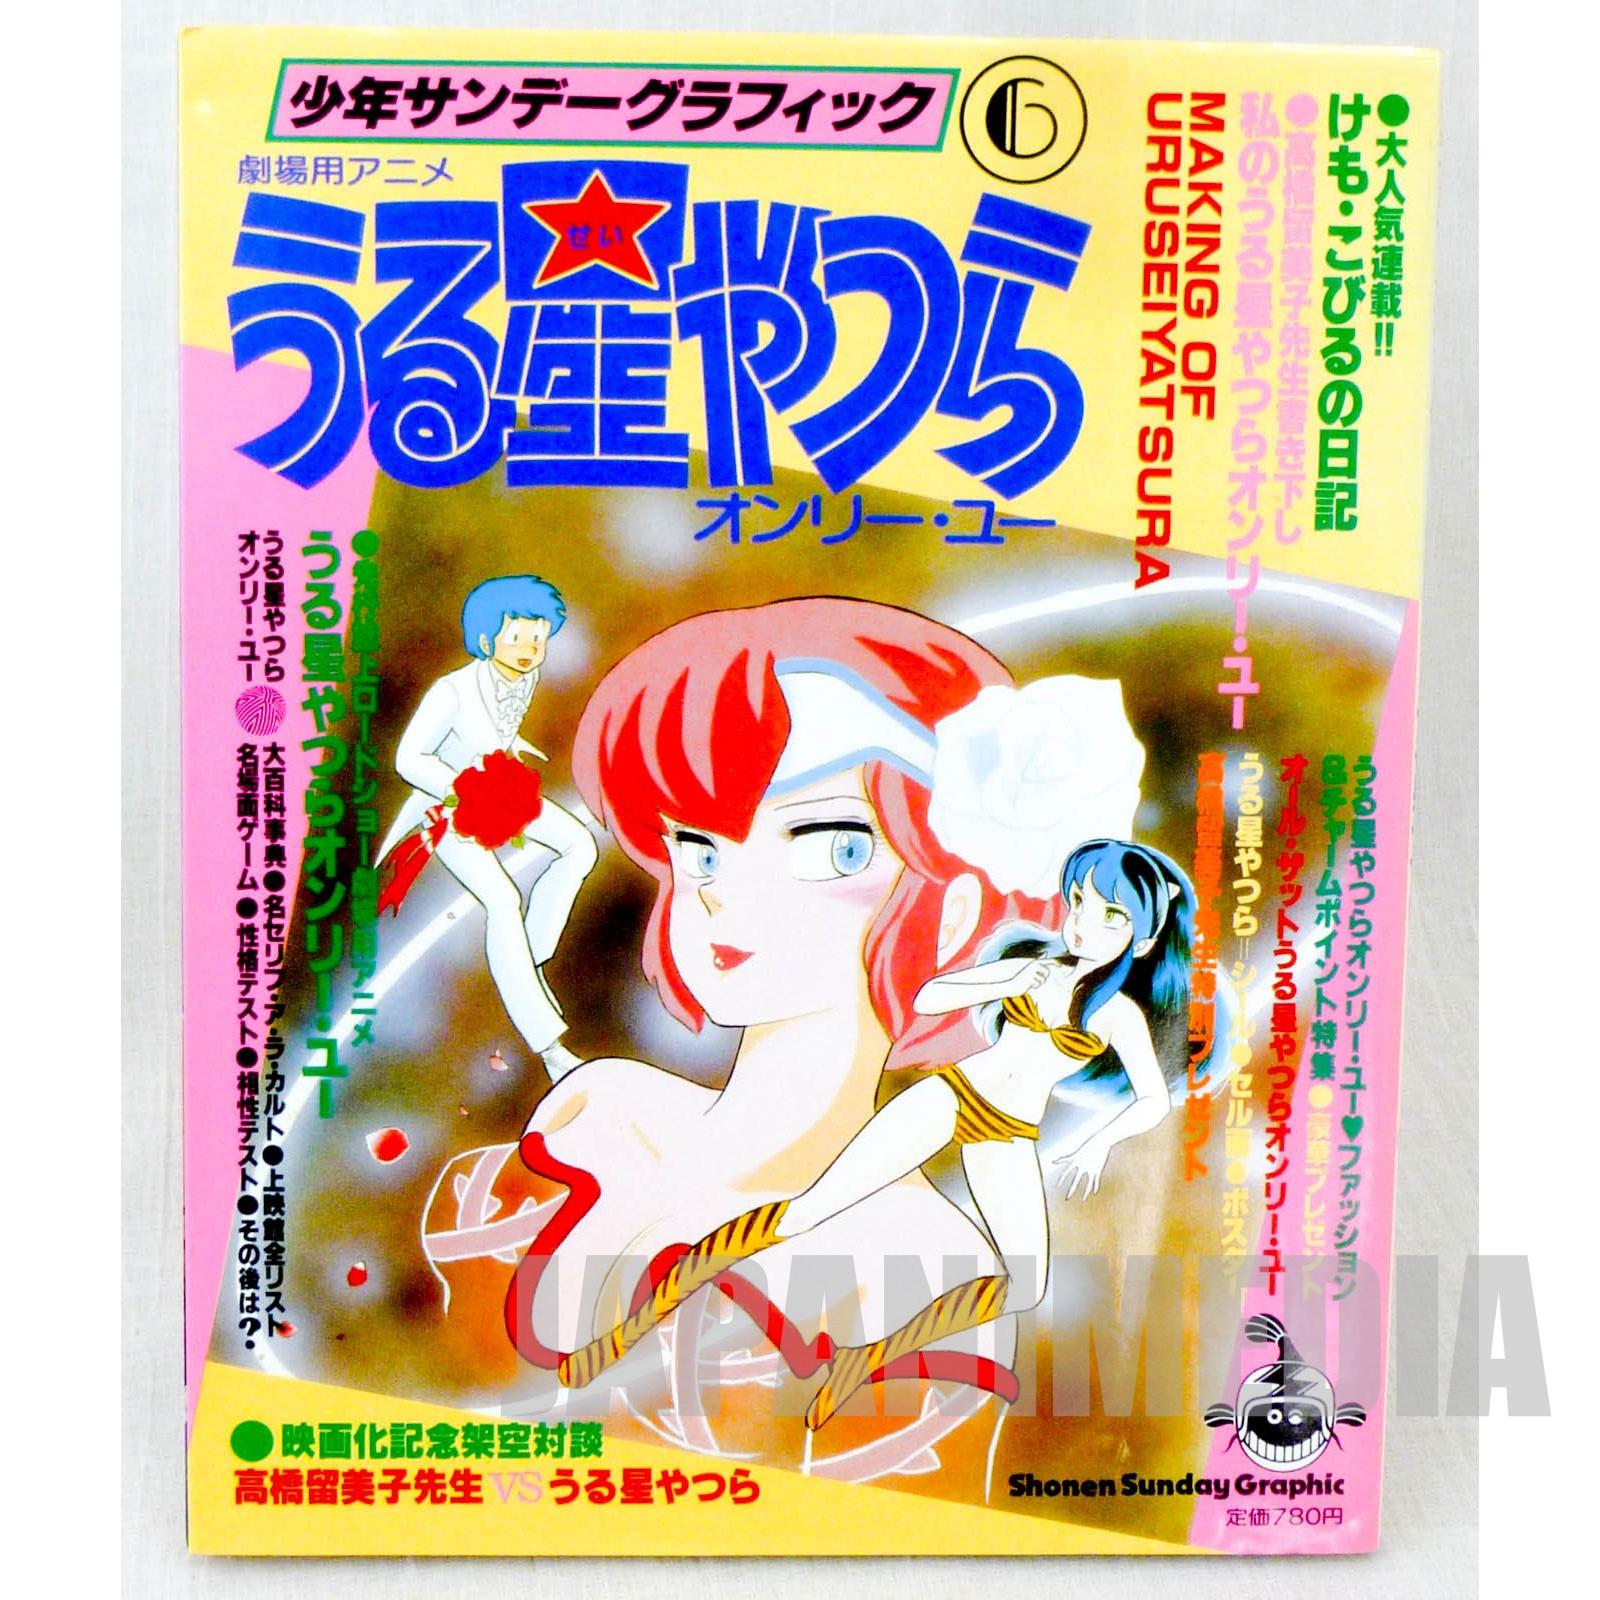 Urusei Yatsura film series Shonen Sunday Graphic Book 6 - Only You - Sticker Poster JAPAN ANIME